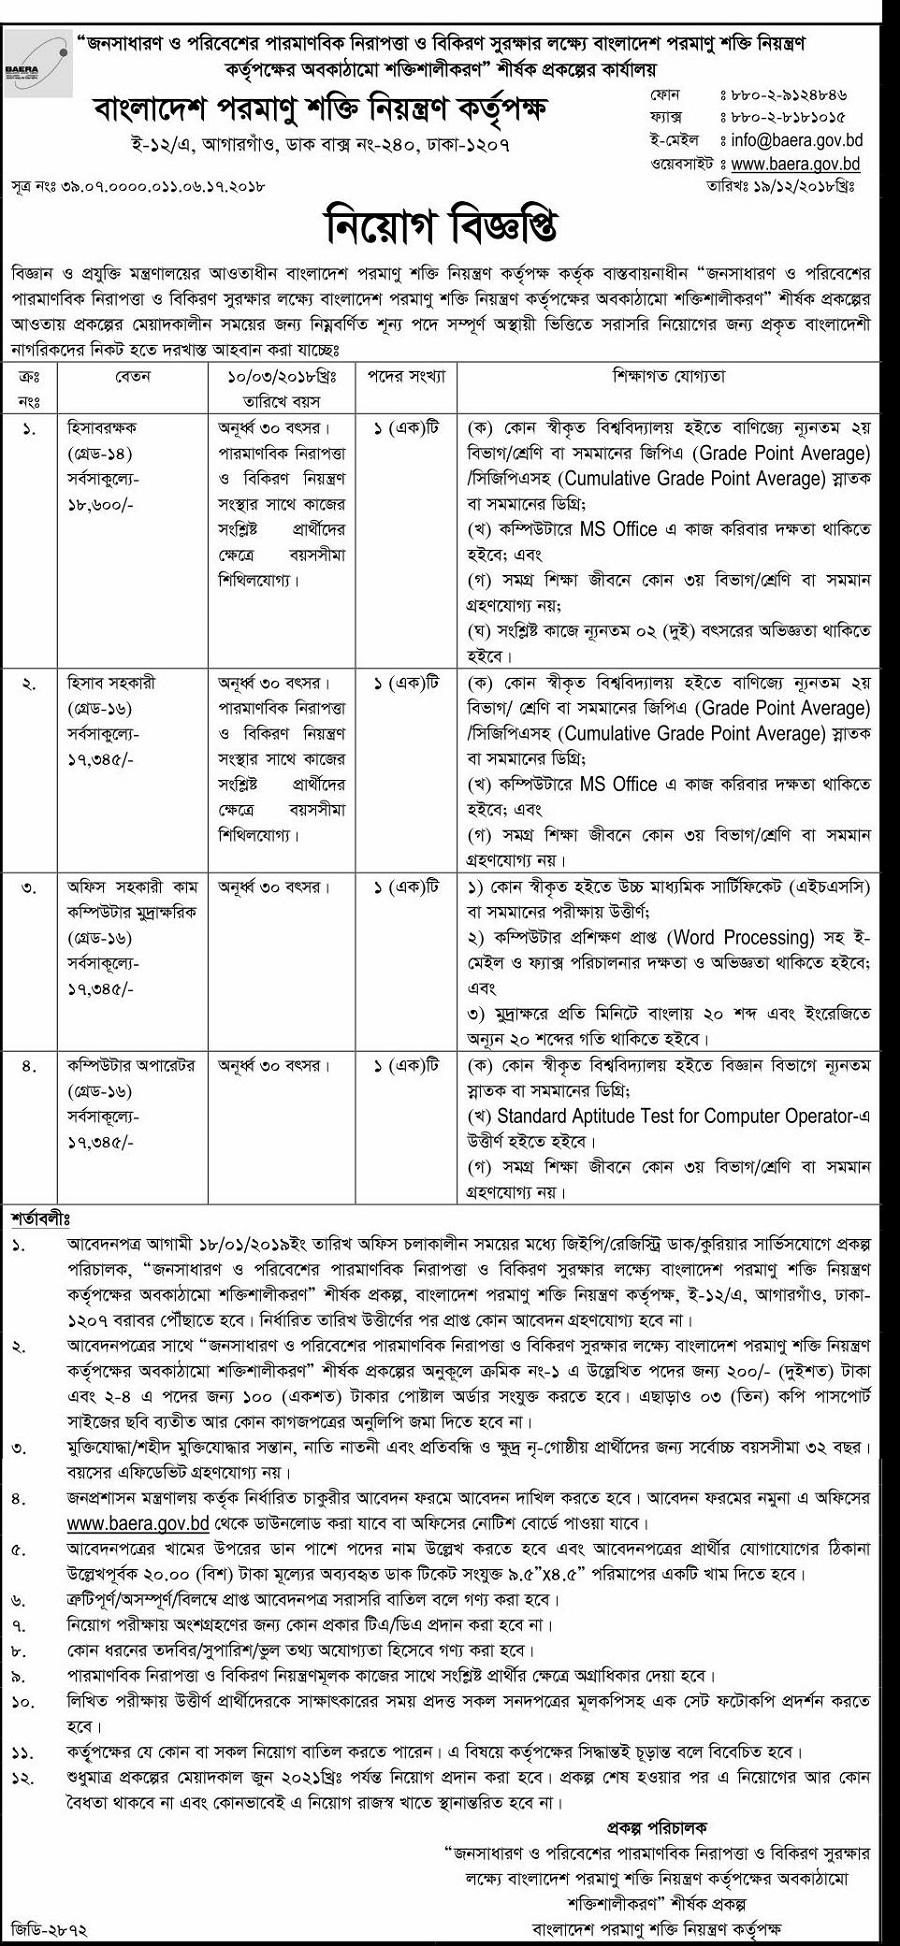 lebanese atomic energy commission job application form